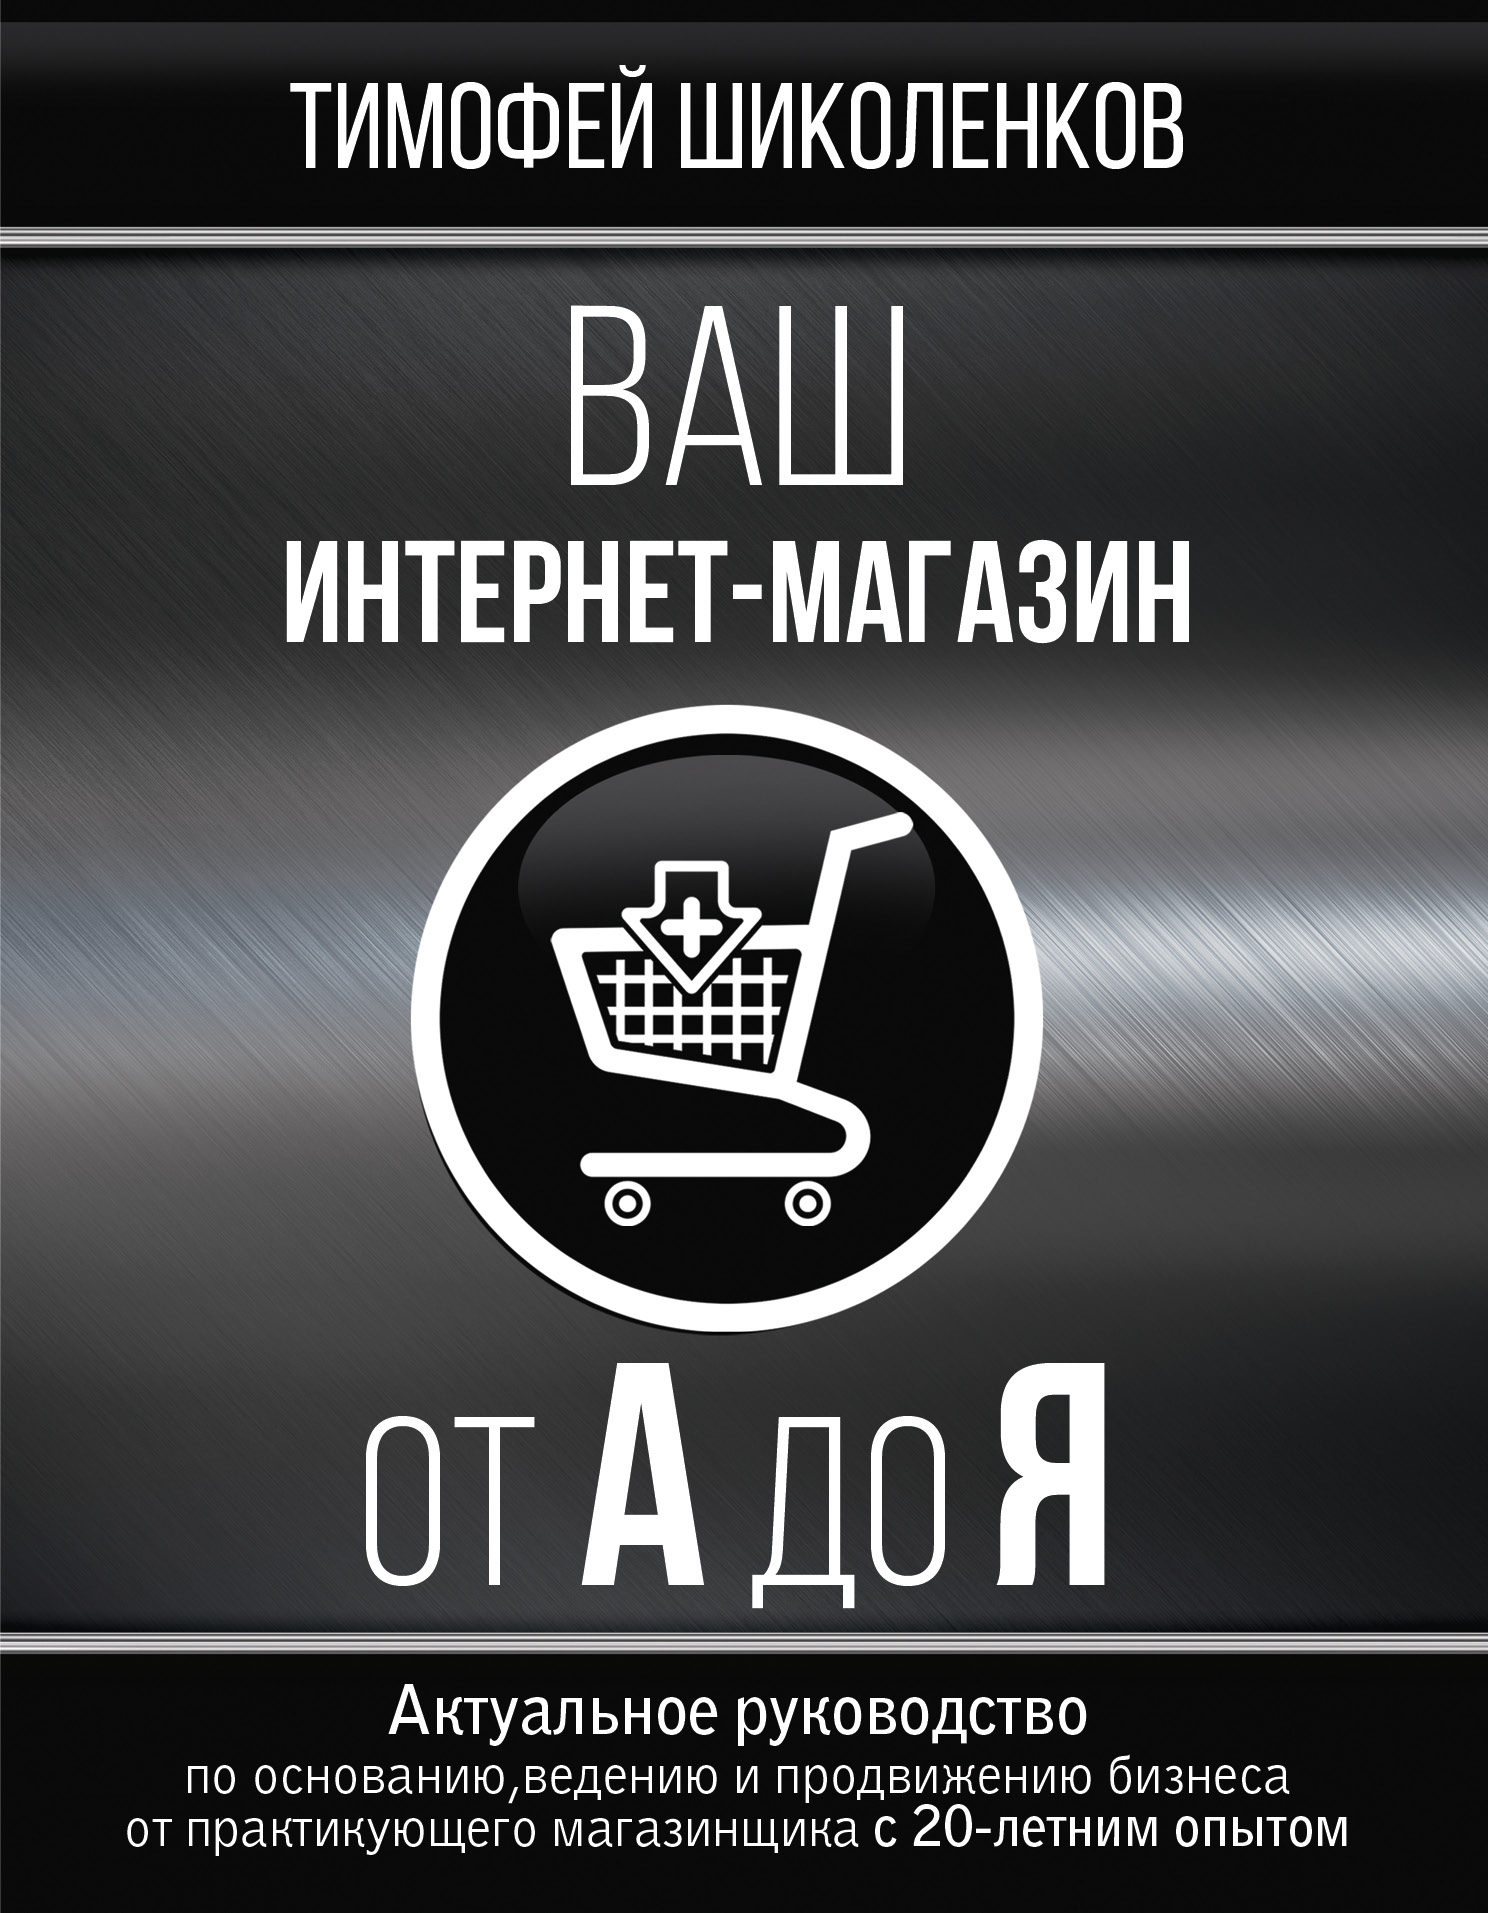 Шиколенков Тимофей Ваш интернет-магазин от А до Я